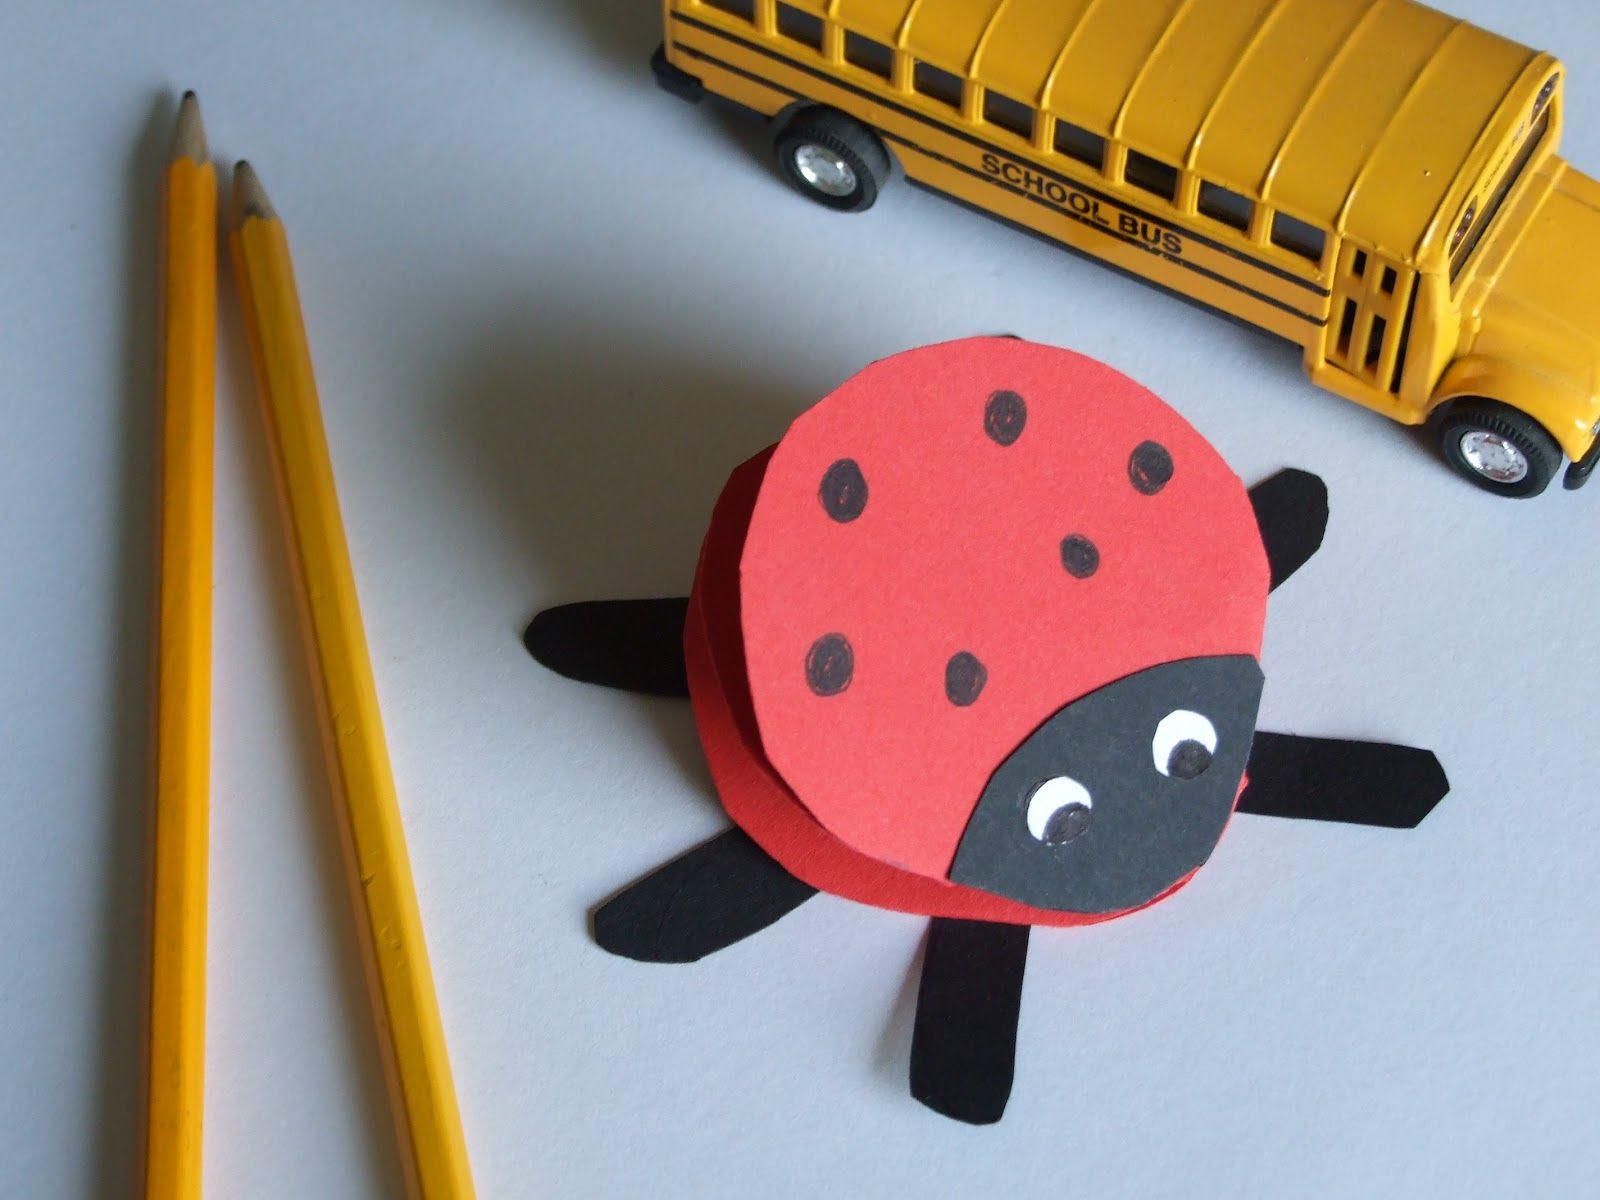 Construction Paper Craft Ideas For Kids Part - 20: Construction Paper Crafts | Easy Crafts For Kids: Paper Ladybug